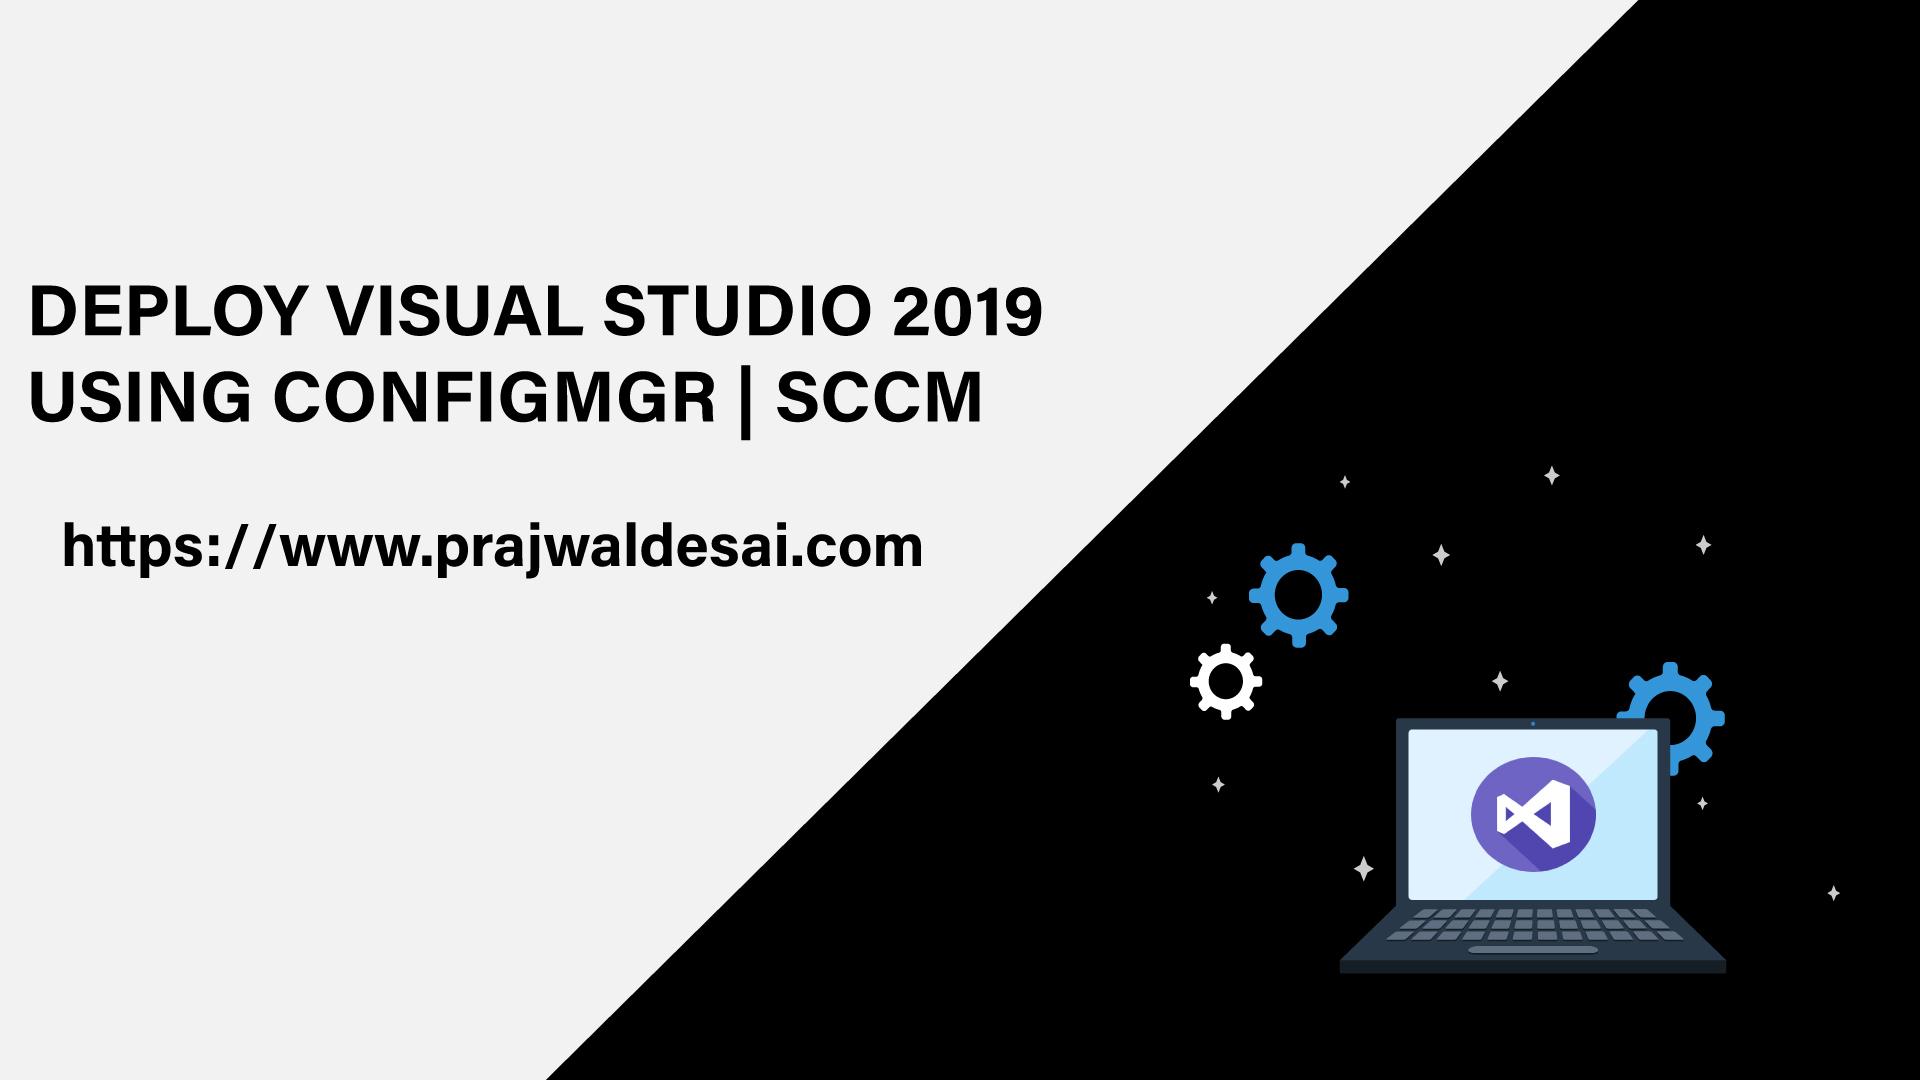 Deploy Visual Studio 2019 using SCCM